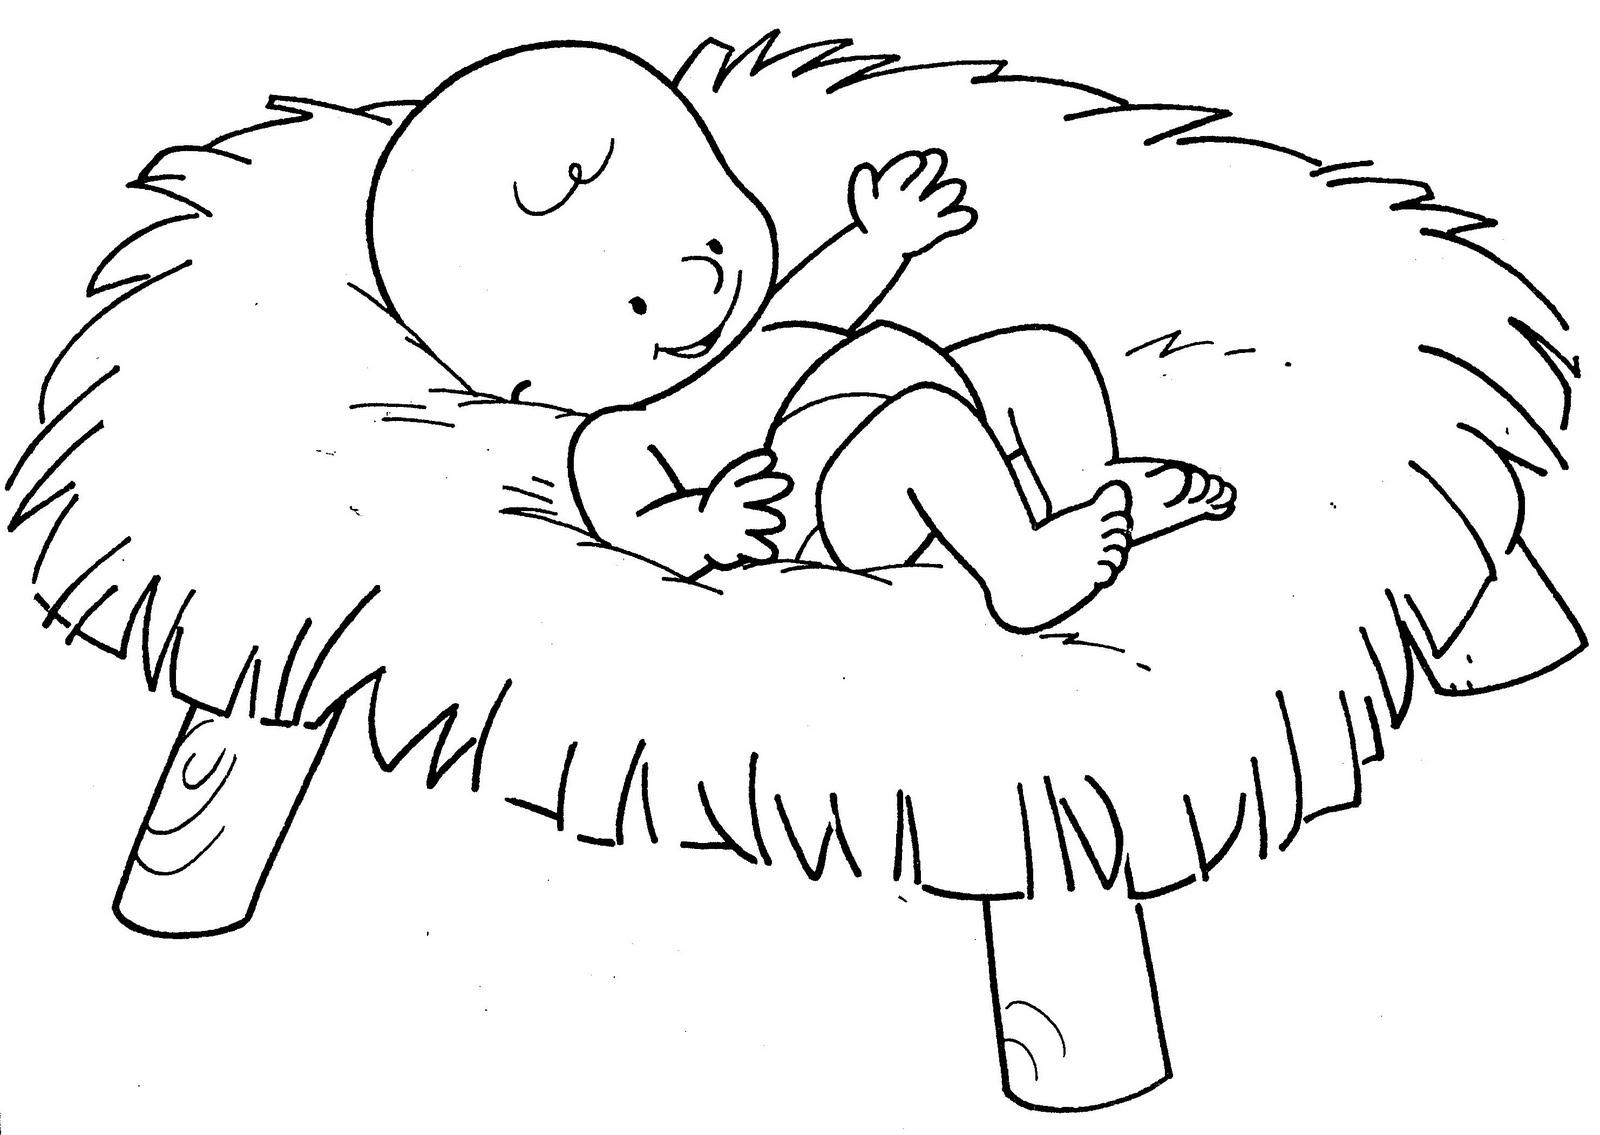 ministÉrio bÍblico infantil virtual por karolline poerner novembro 2009